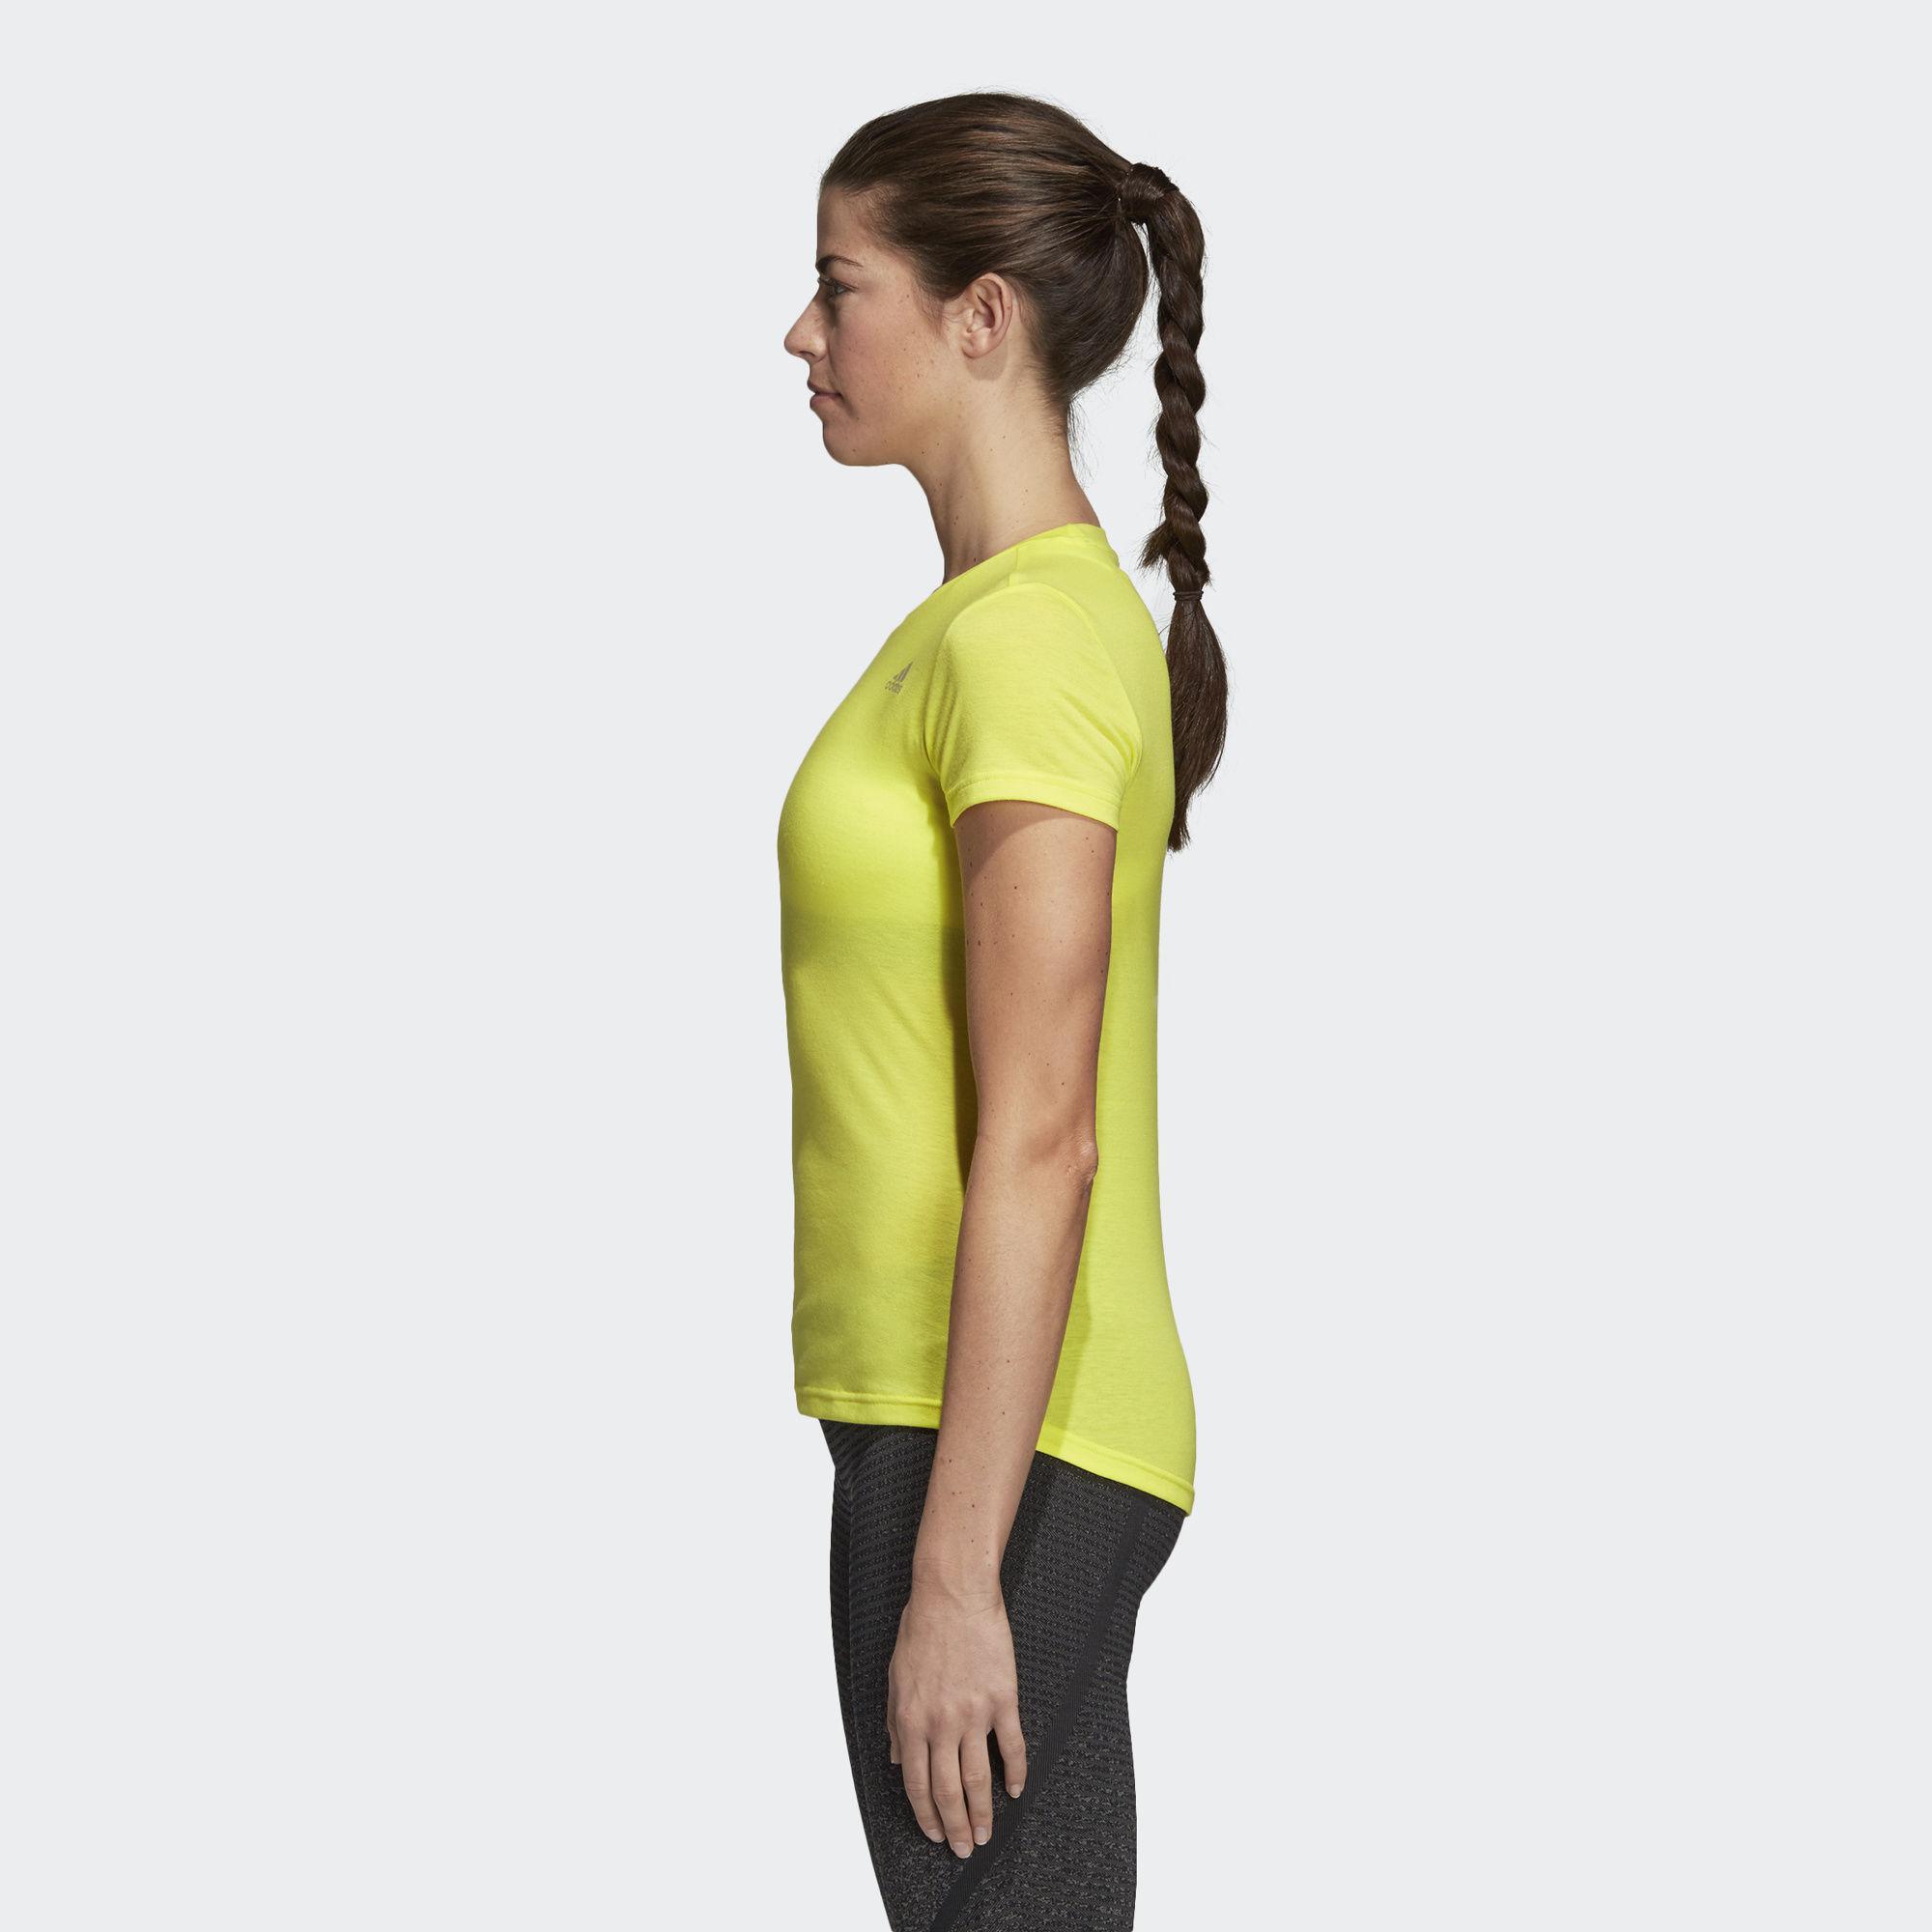 fc0d4db7 Adidas - Yellow Freelift Prime Tee - Lyst. View fullscreen